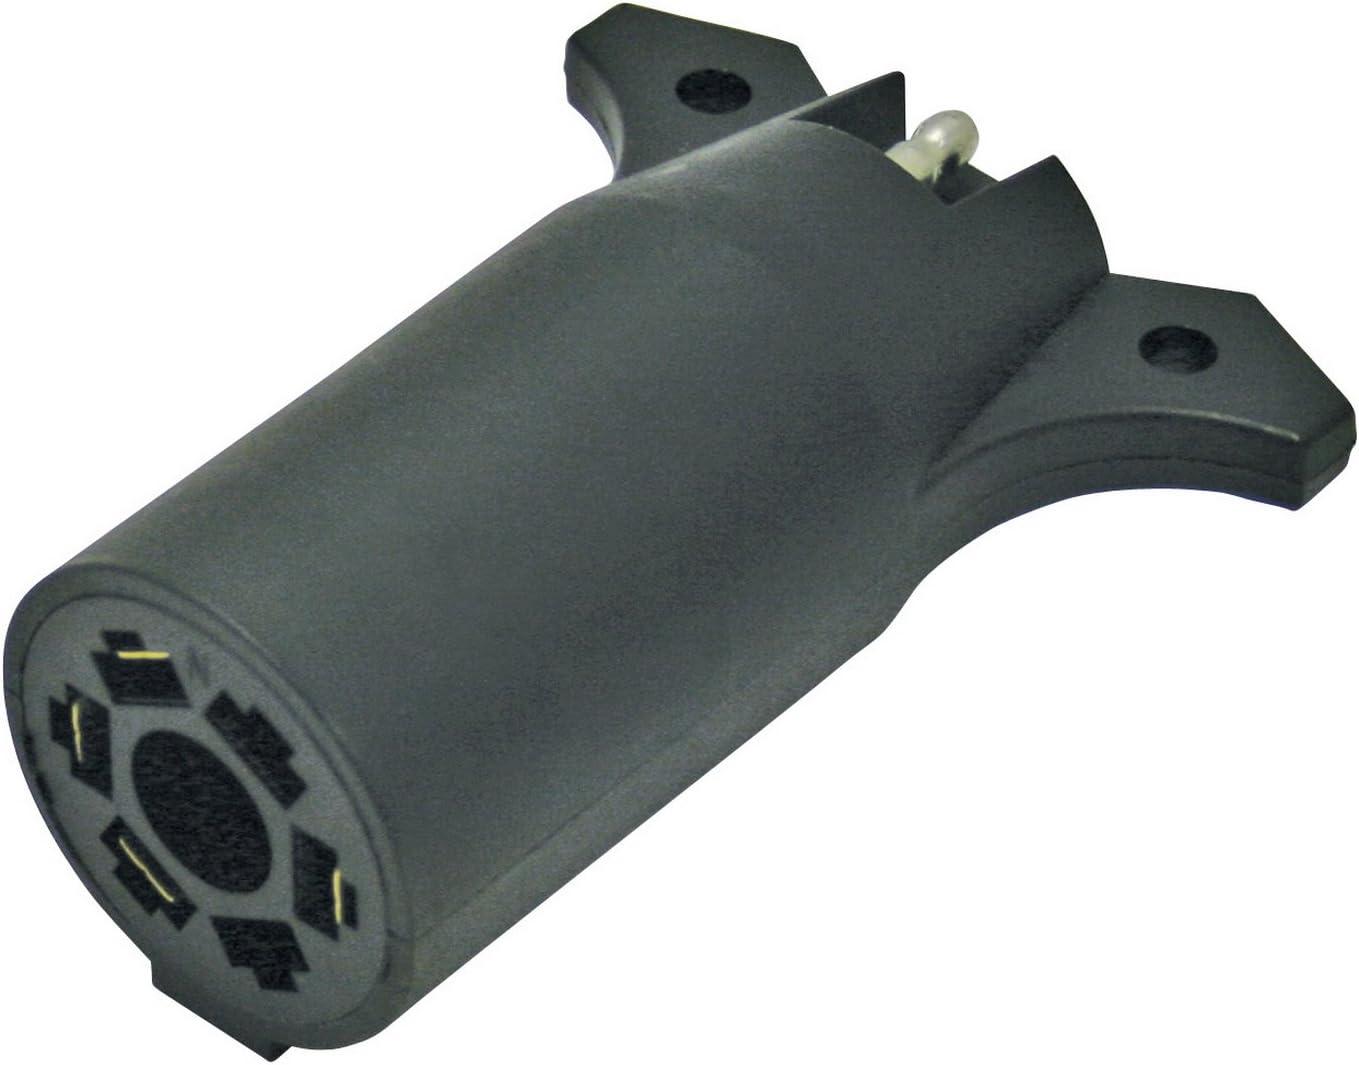 Reese Towpower 74607 7-Way to 4-Way Flat Blade Wiring Adapter Black